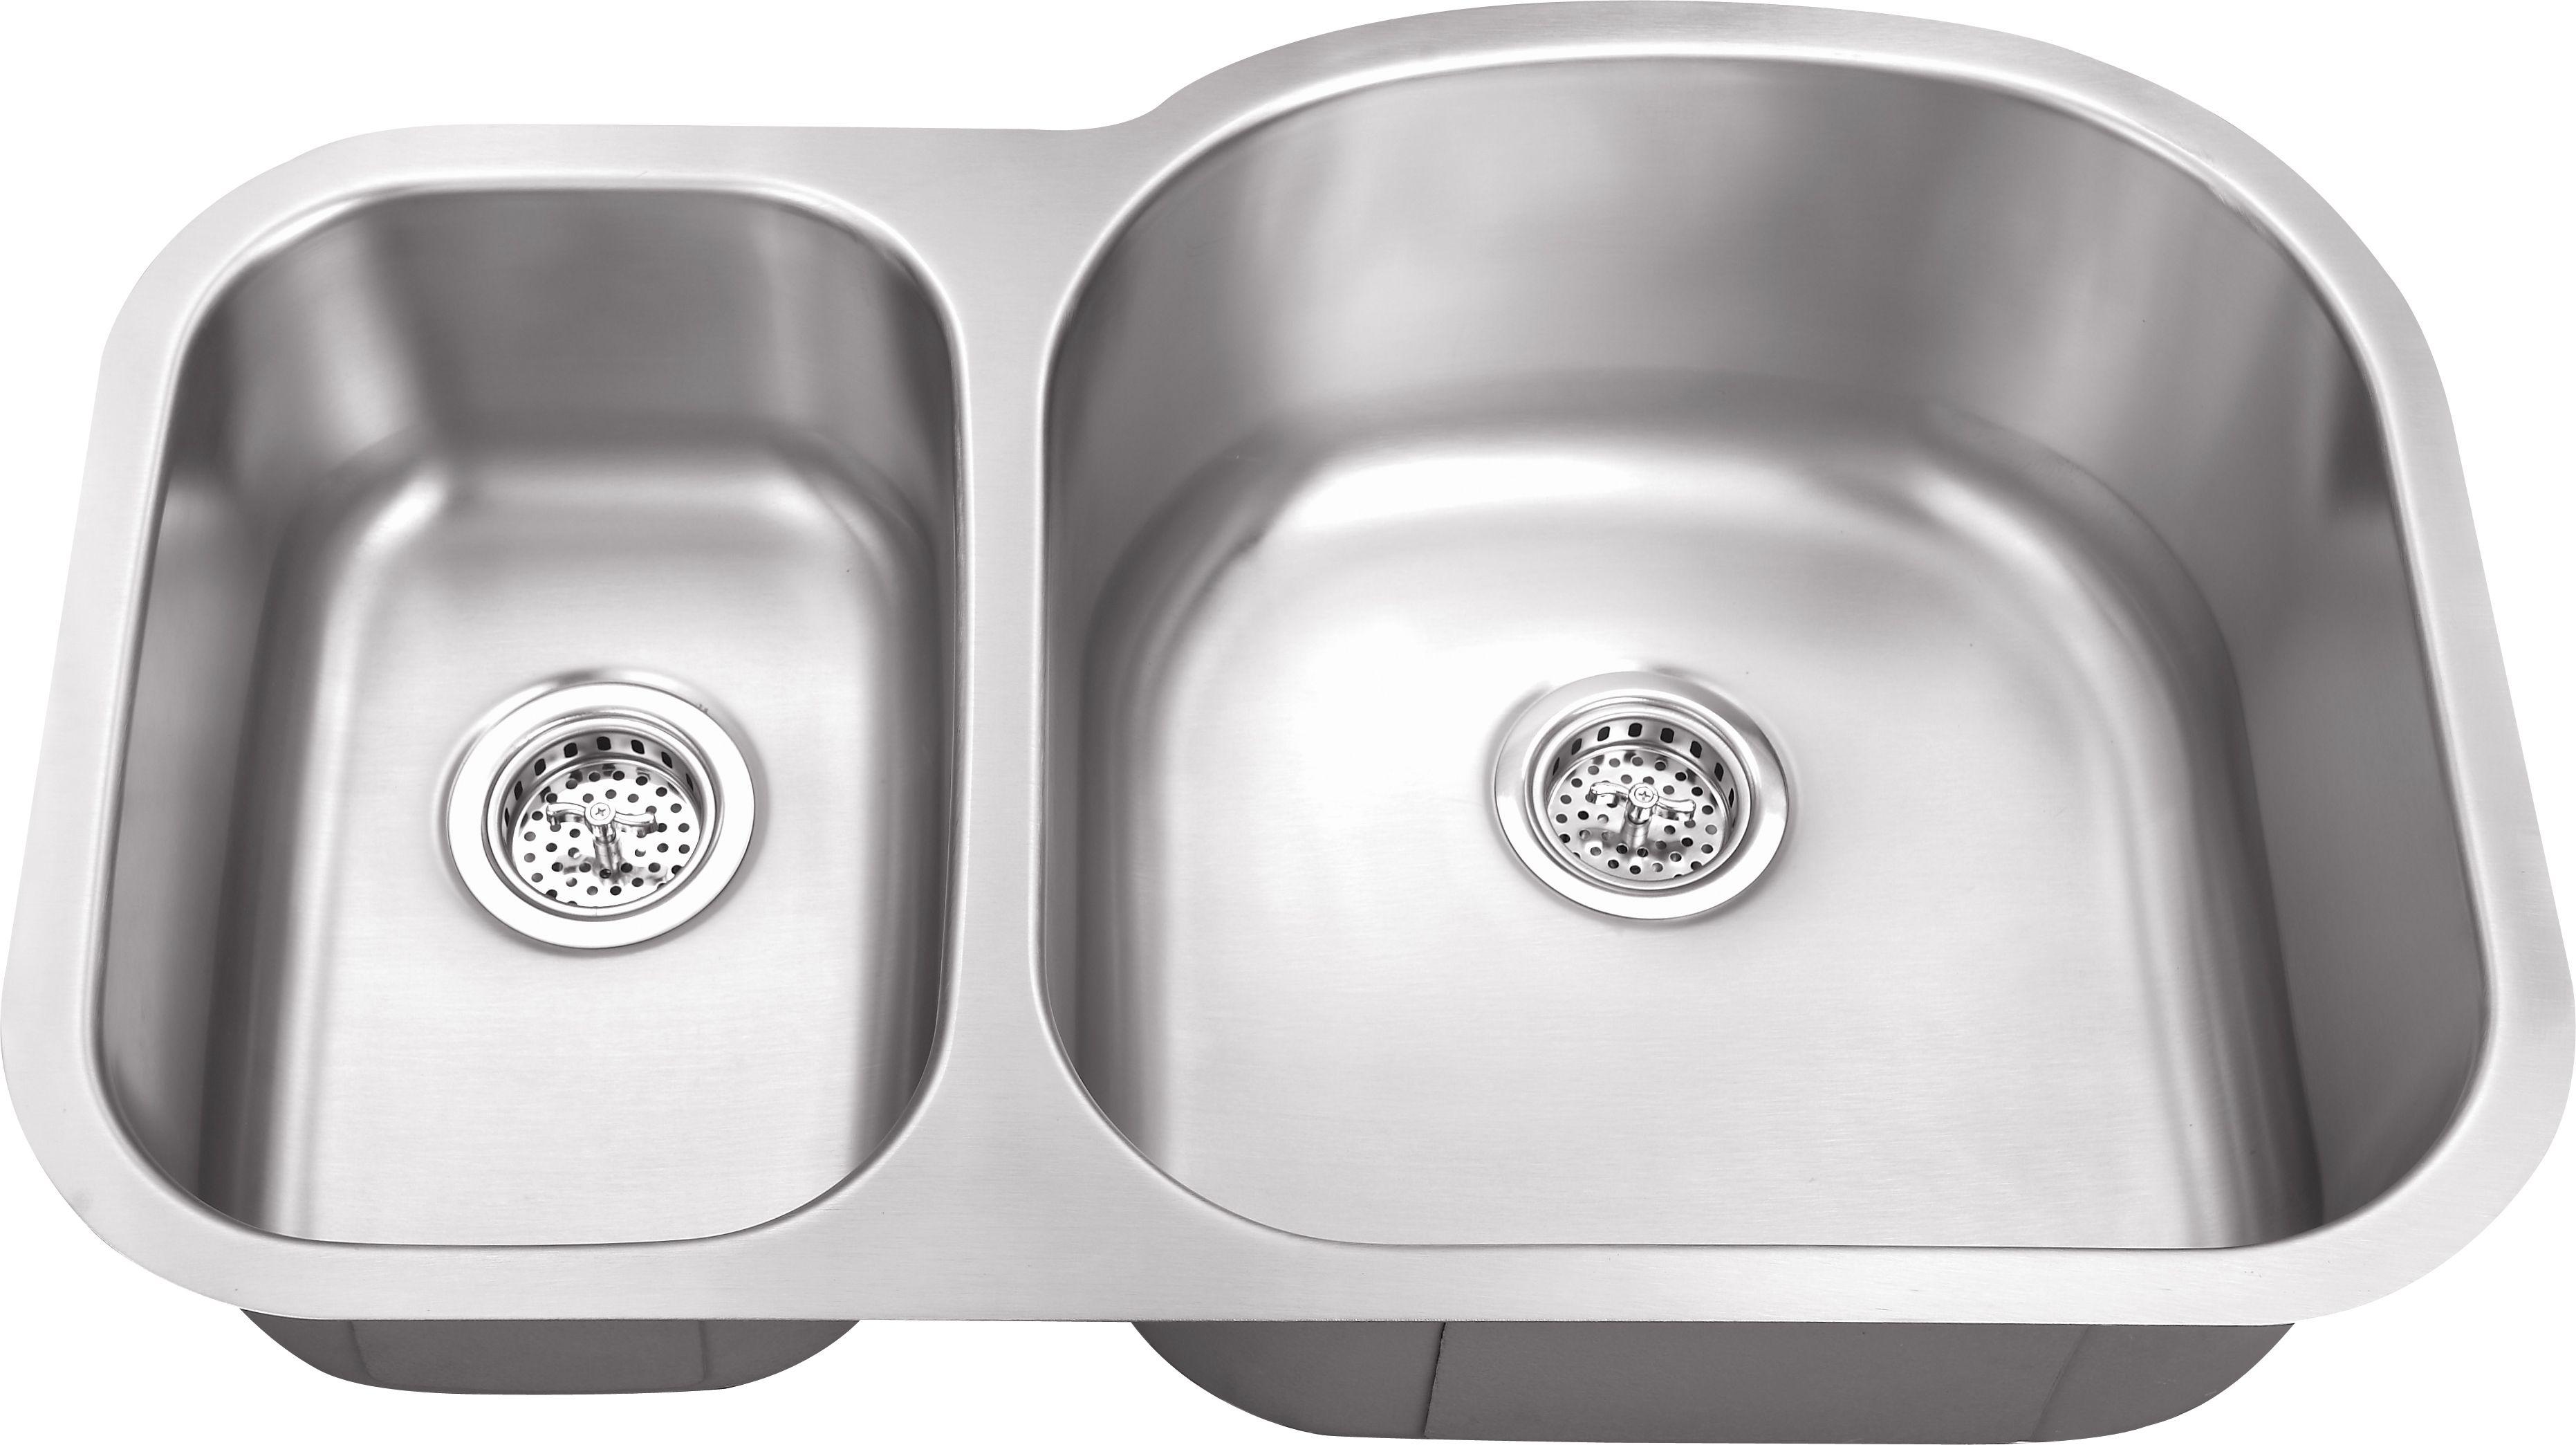 M 308rv 18 gauge euro style double bowl undermount stainless steel kitchen sink 30